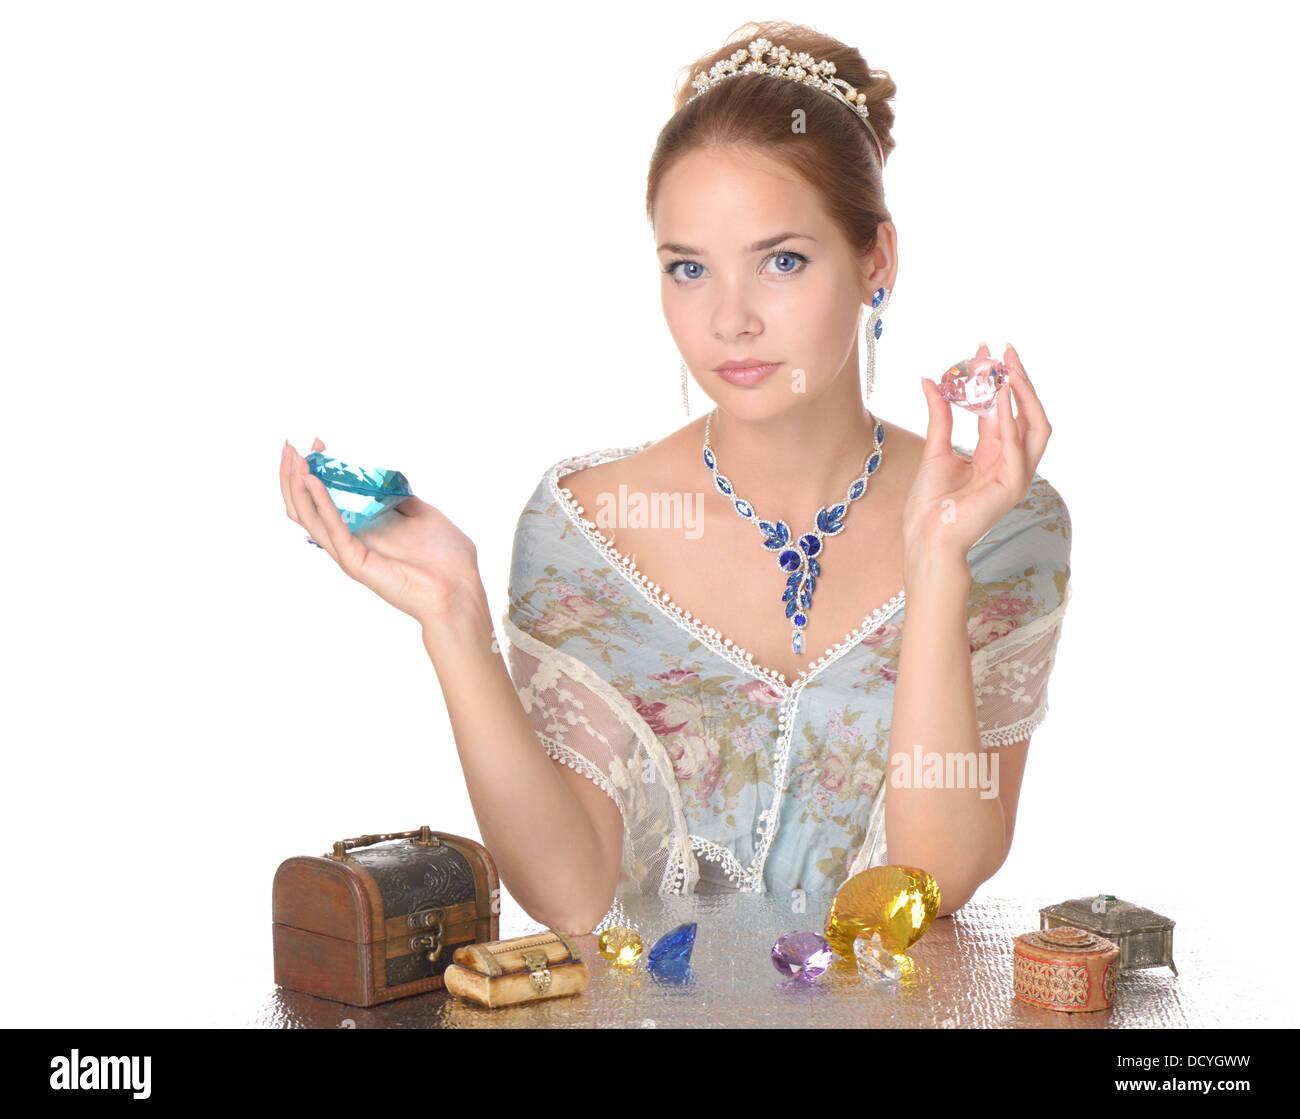 Jewels and diamonds - Stock Image